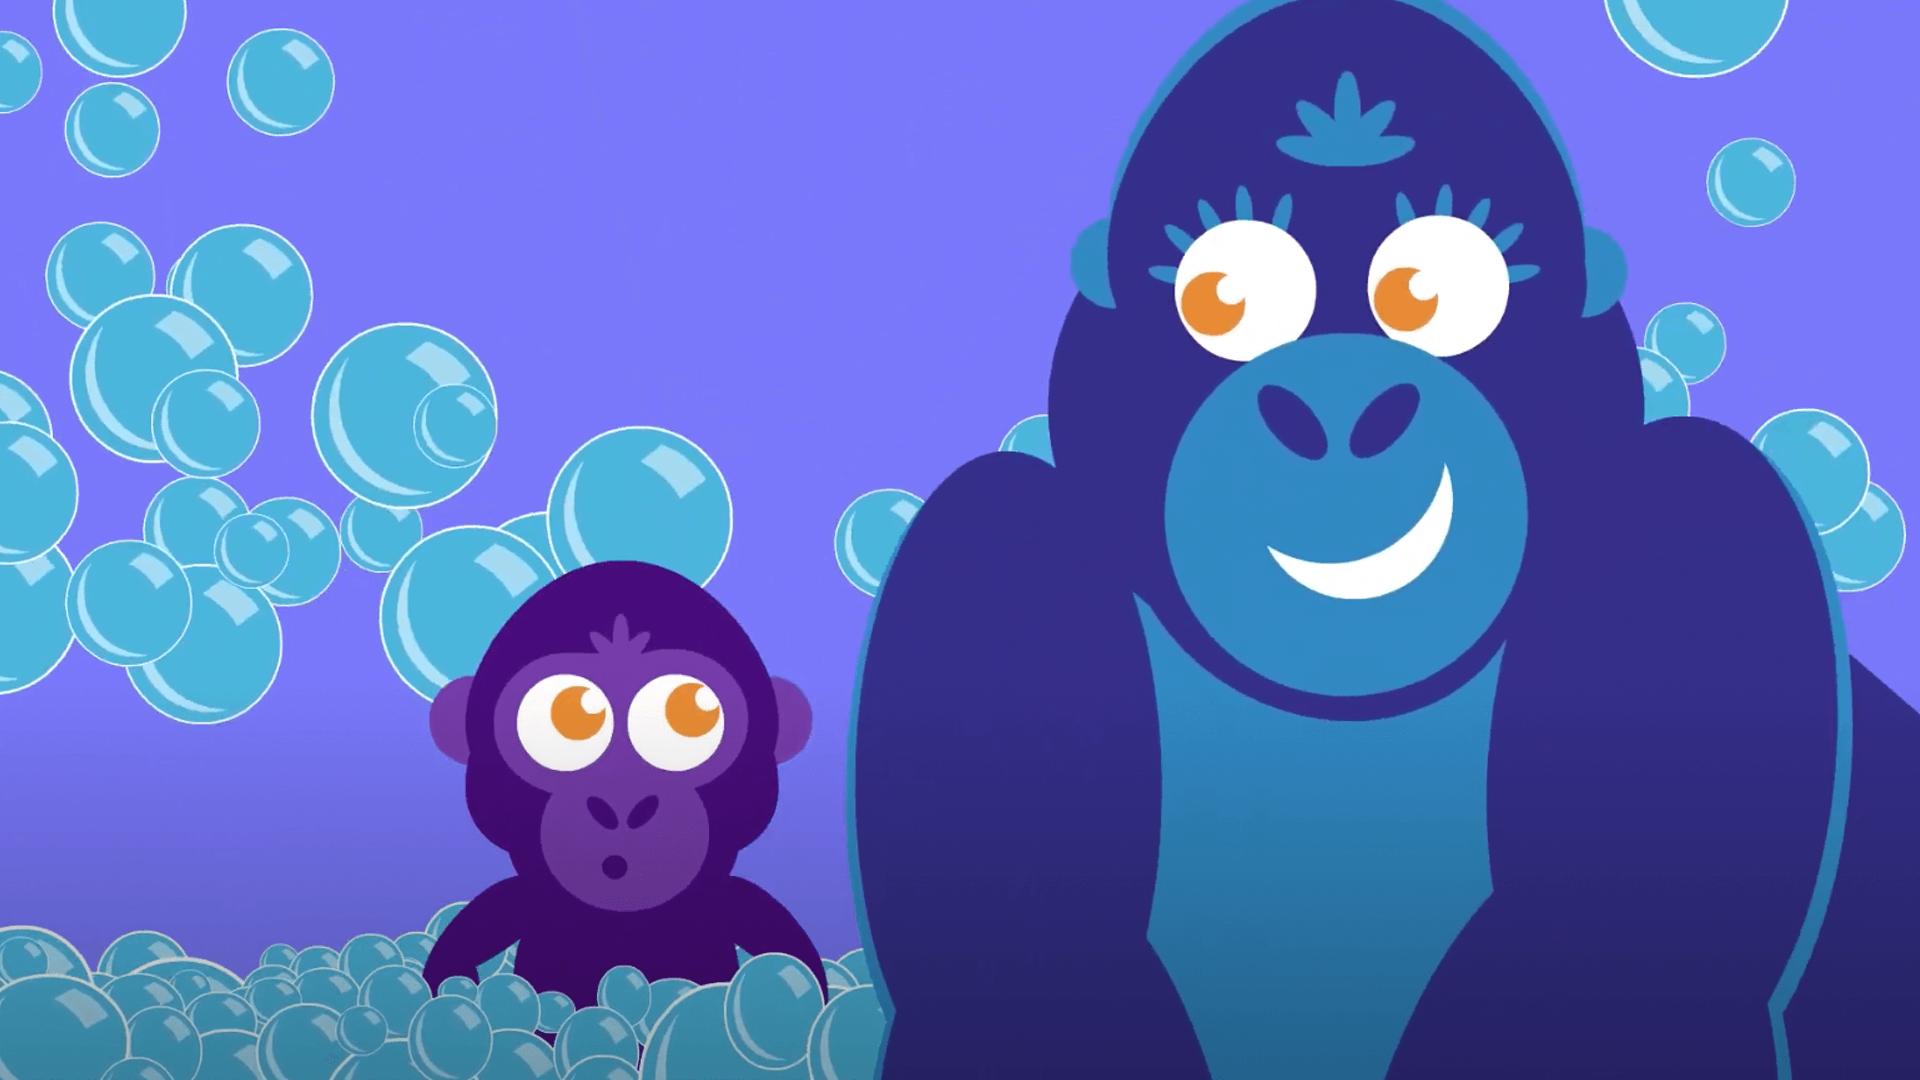 mommy & me song gorilla mom